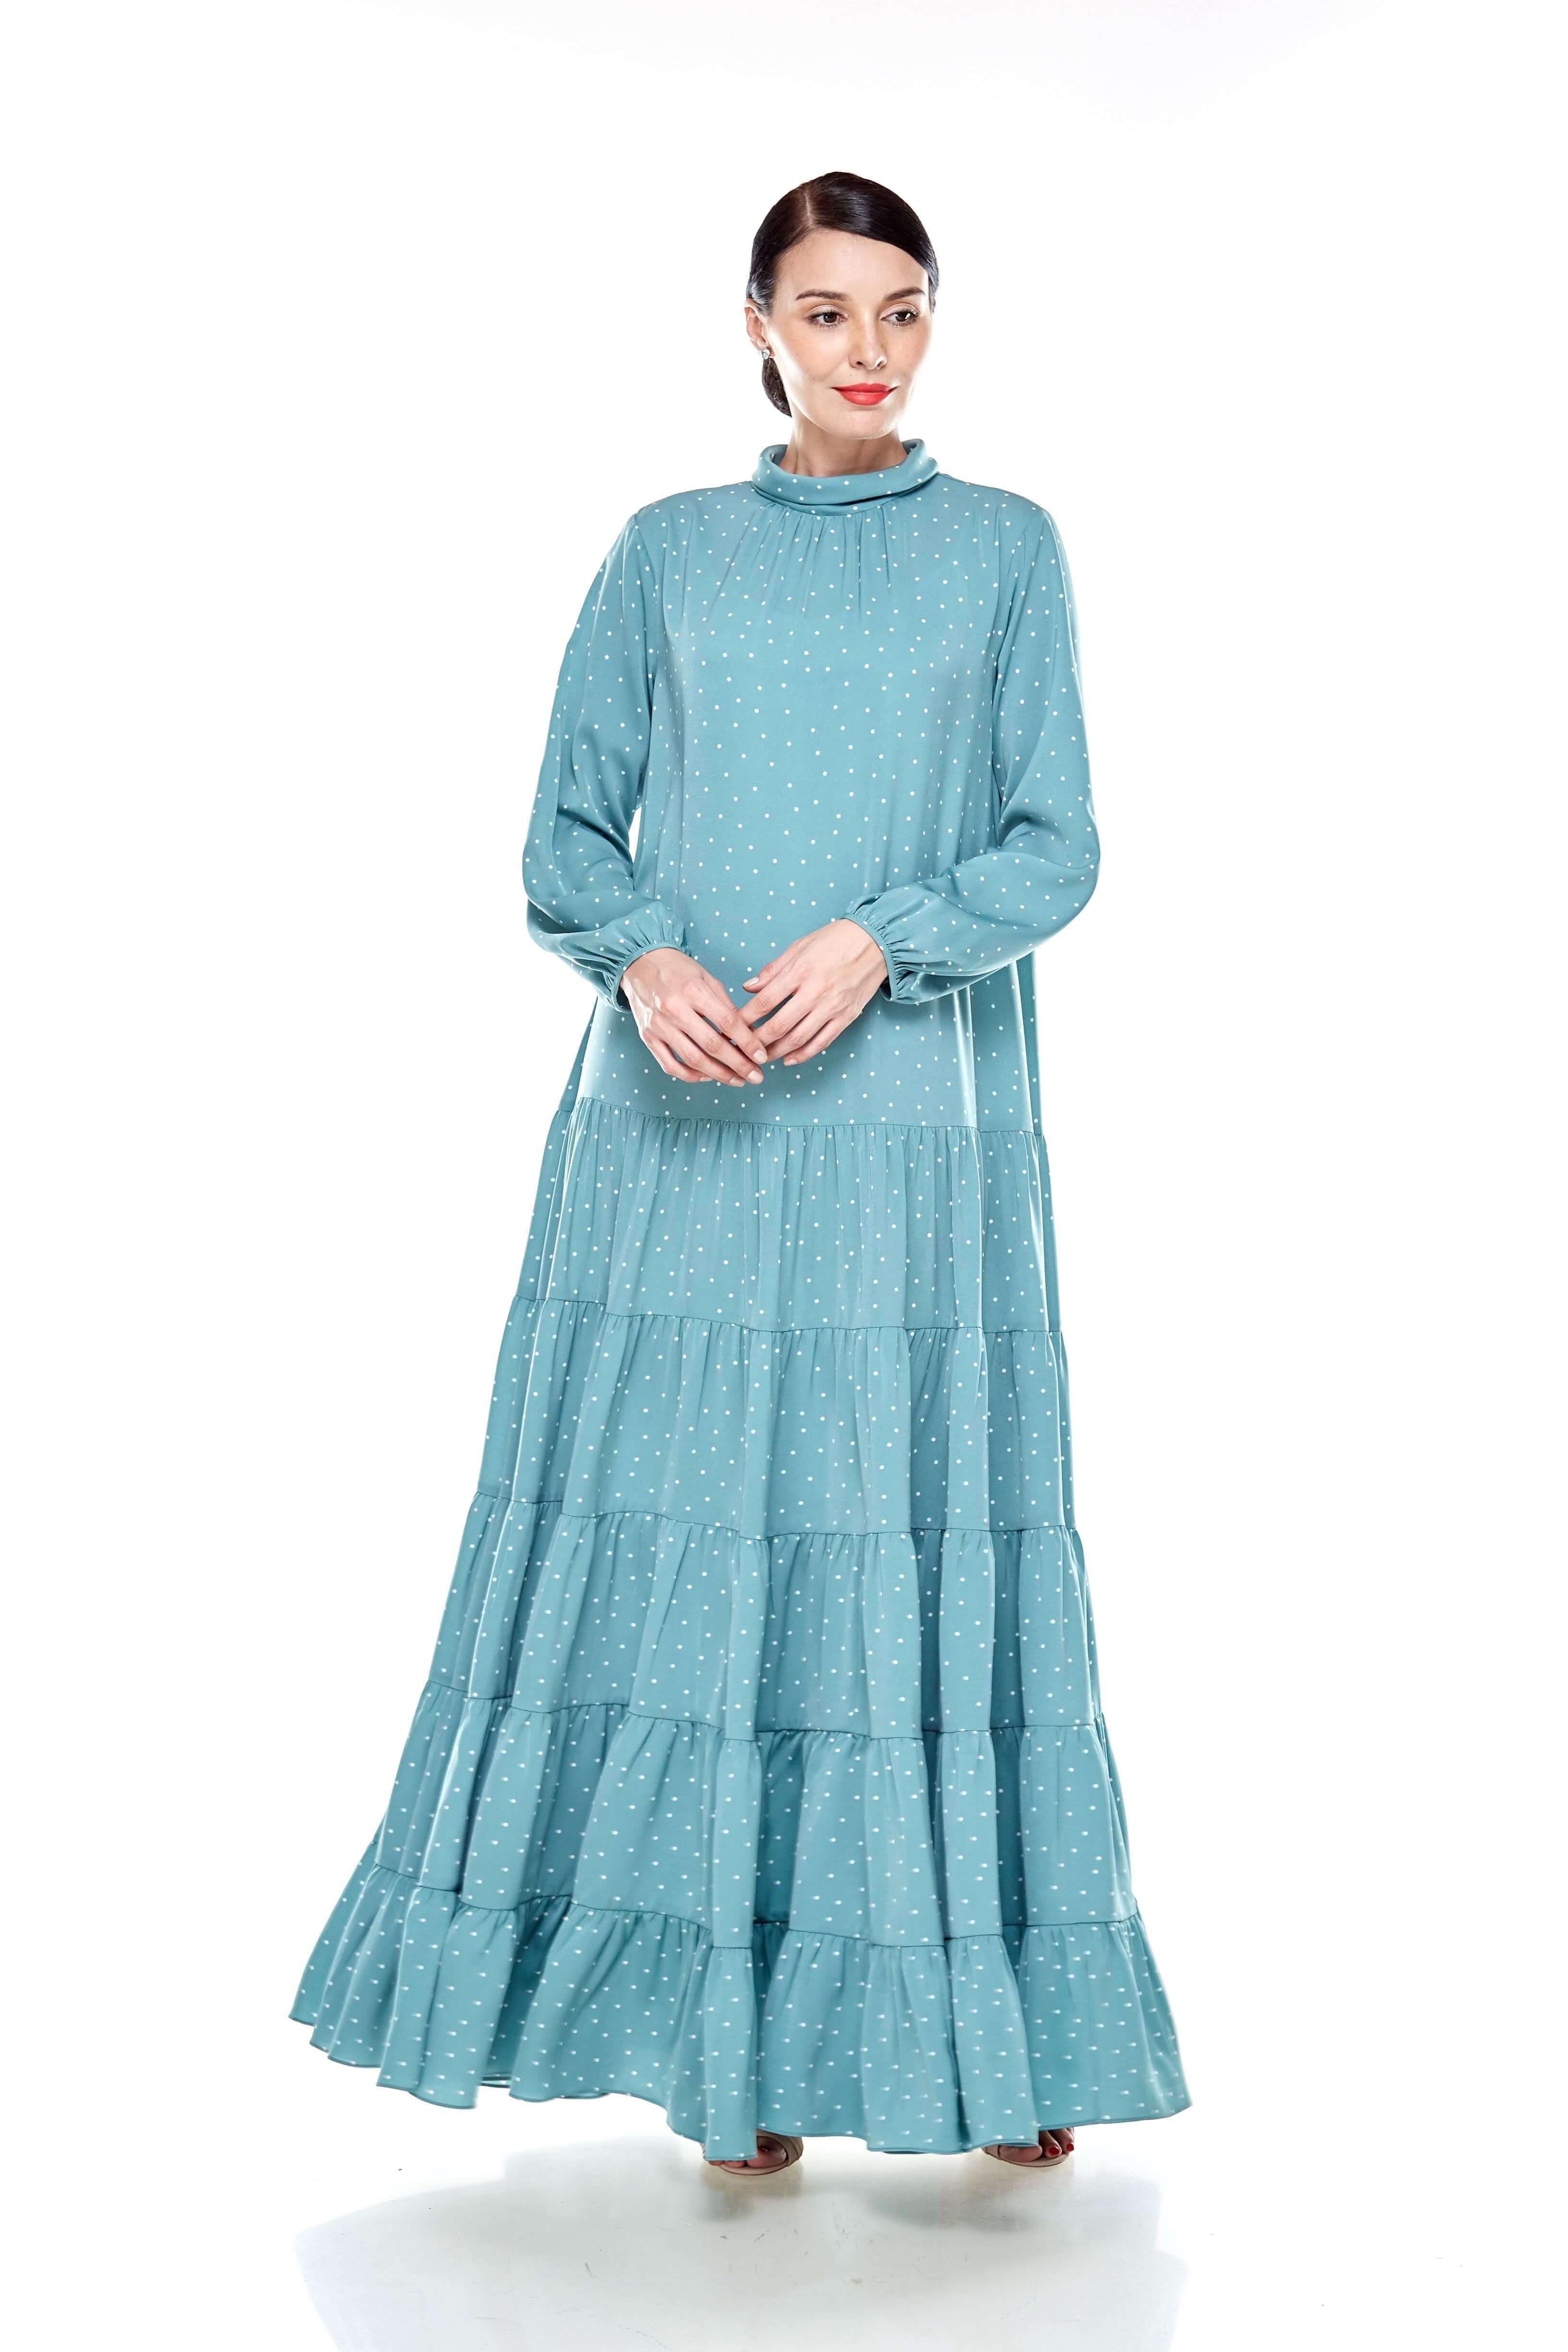 Mint Polka Dot Stand Collar Tier Dress (6)